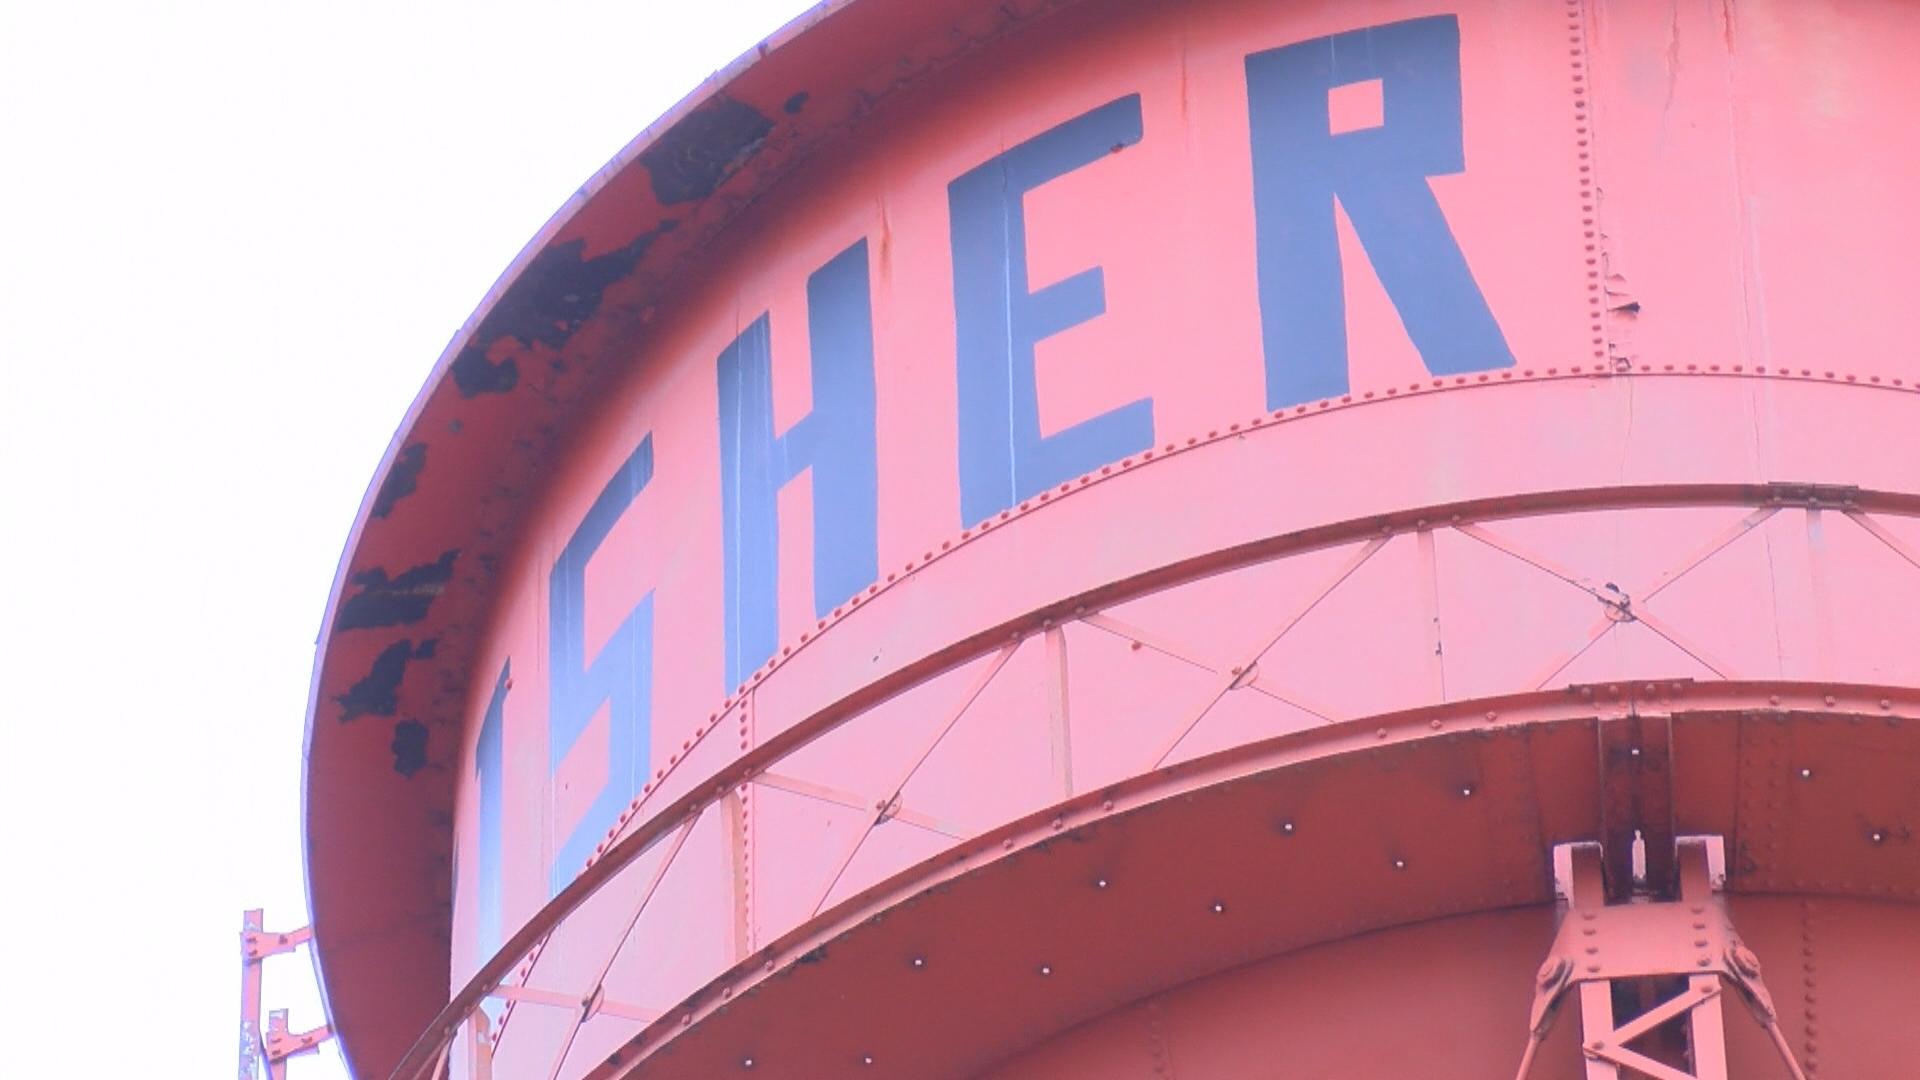 fisher water tower_1490996259693.jpg